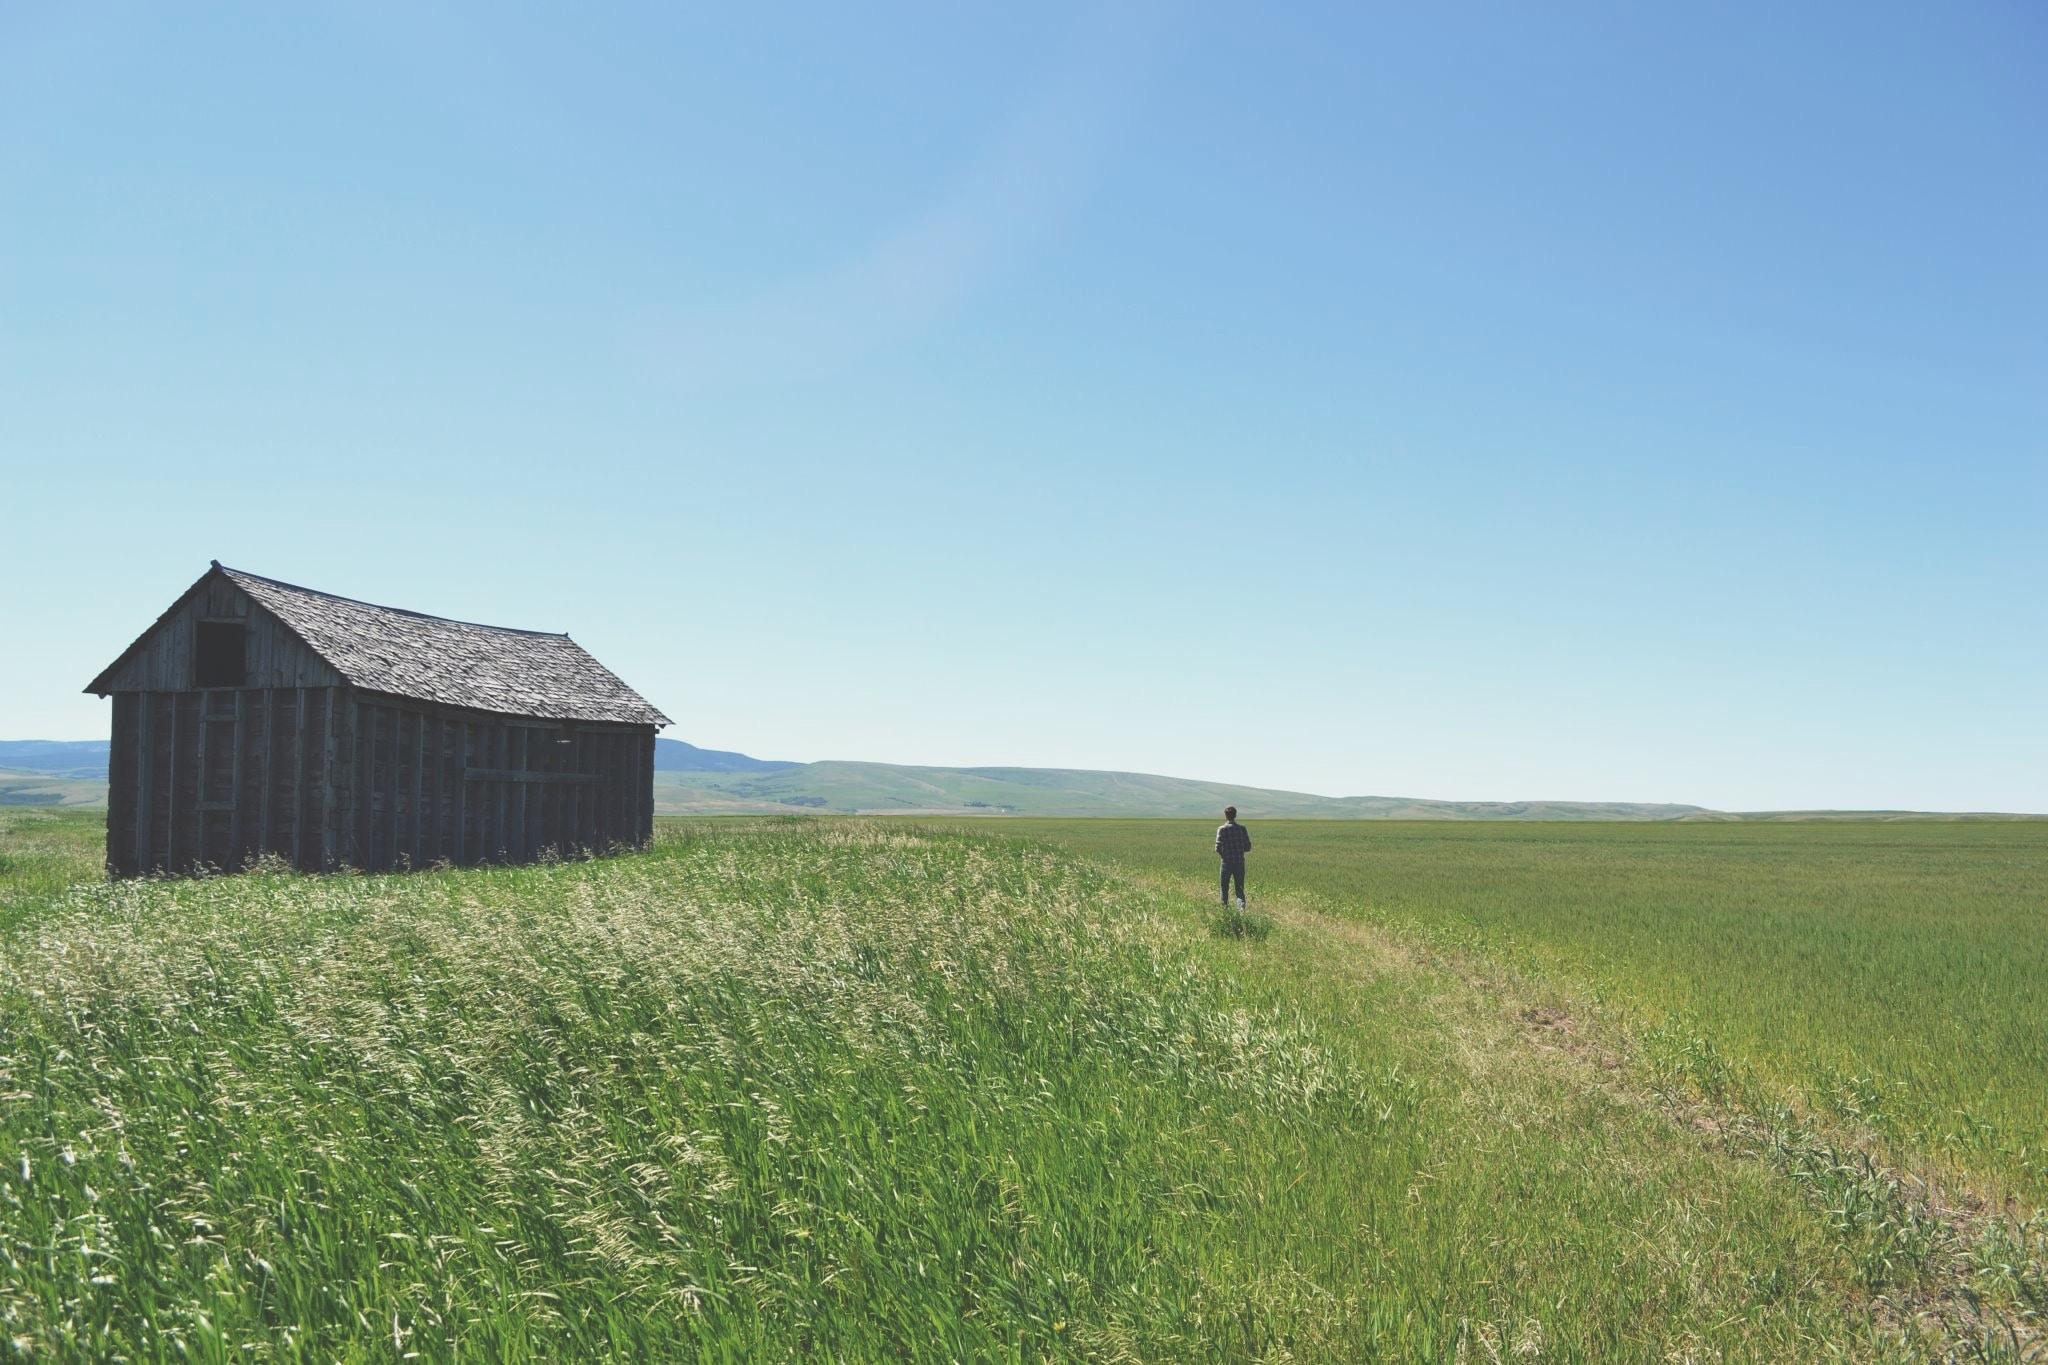 man walking on green grass field during daytime